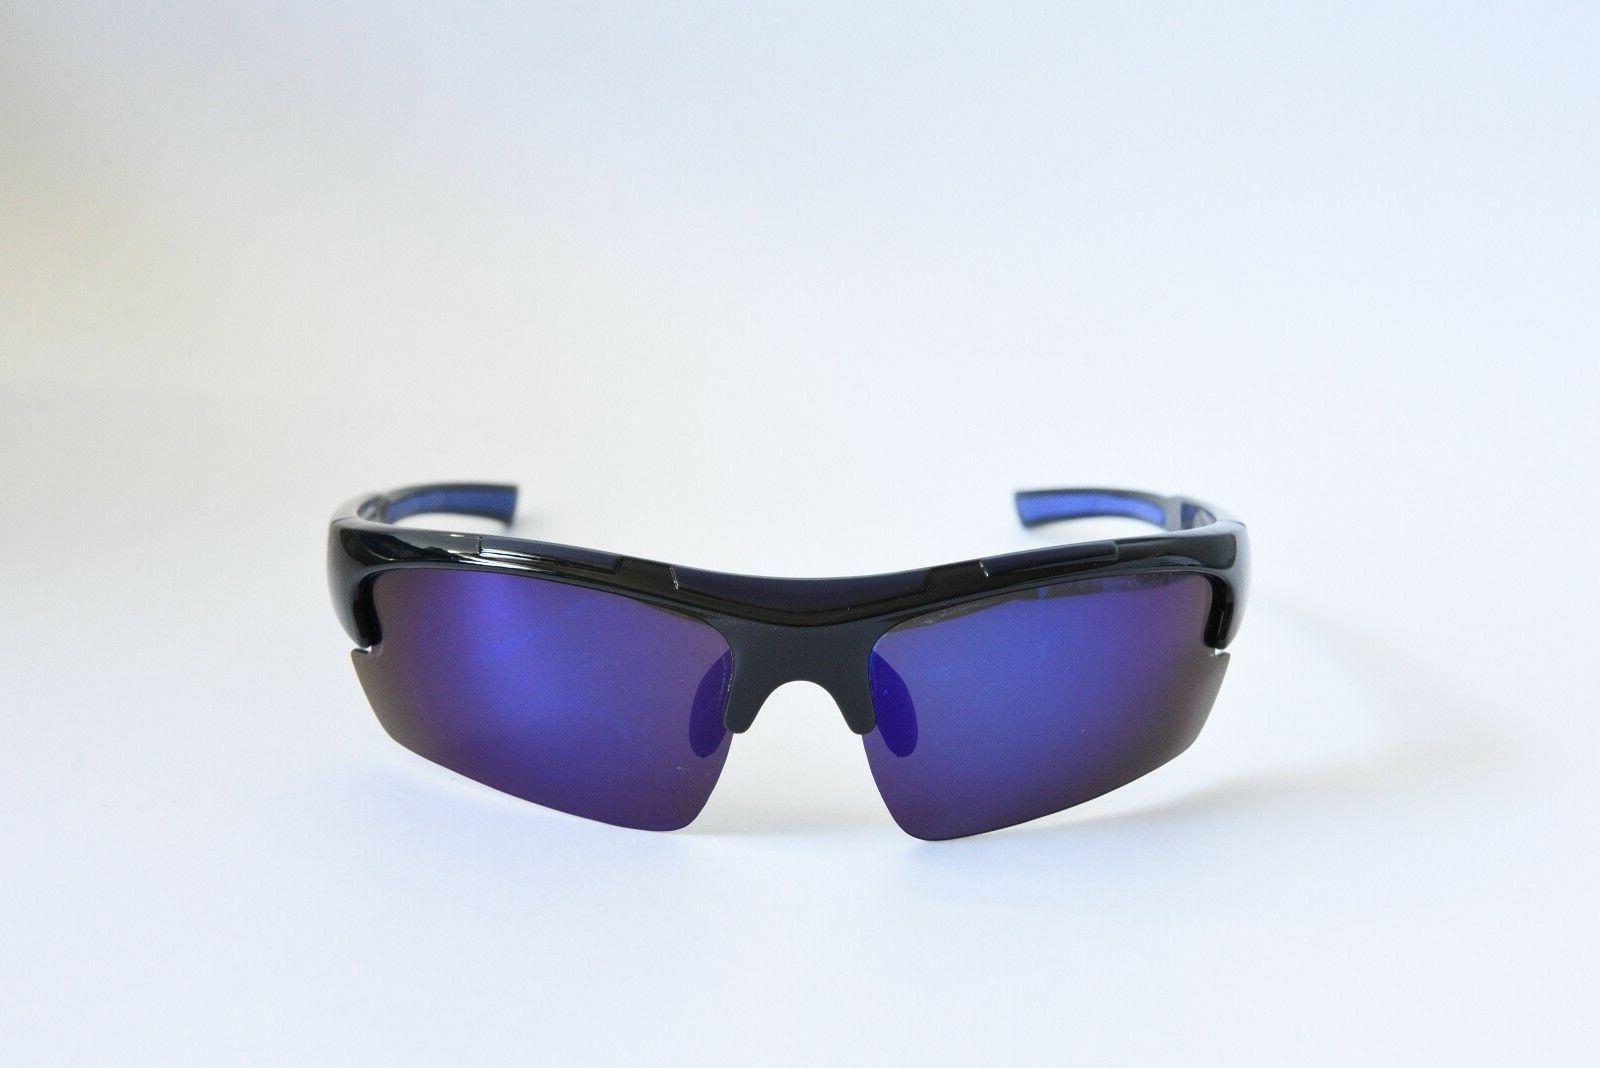 polarized lightweight sport sunglasses black blue mirror